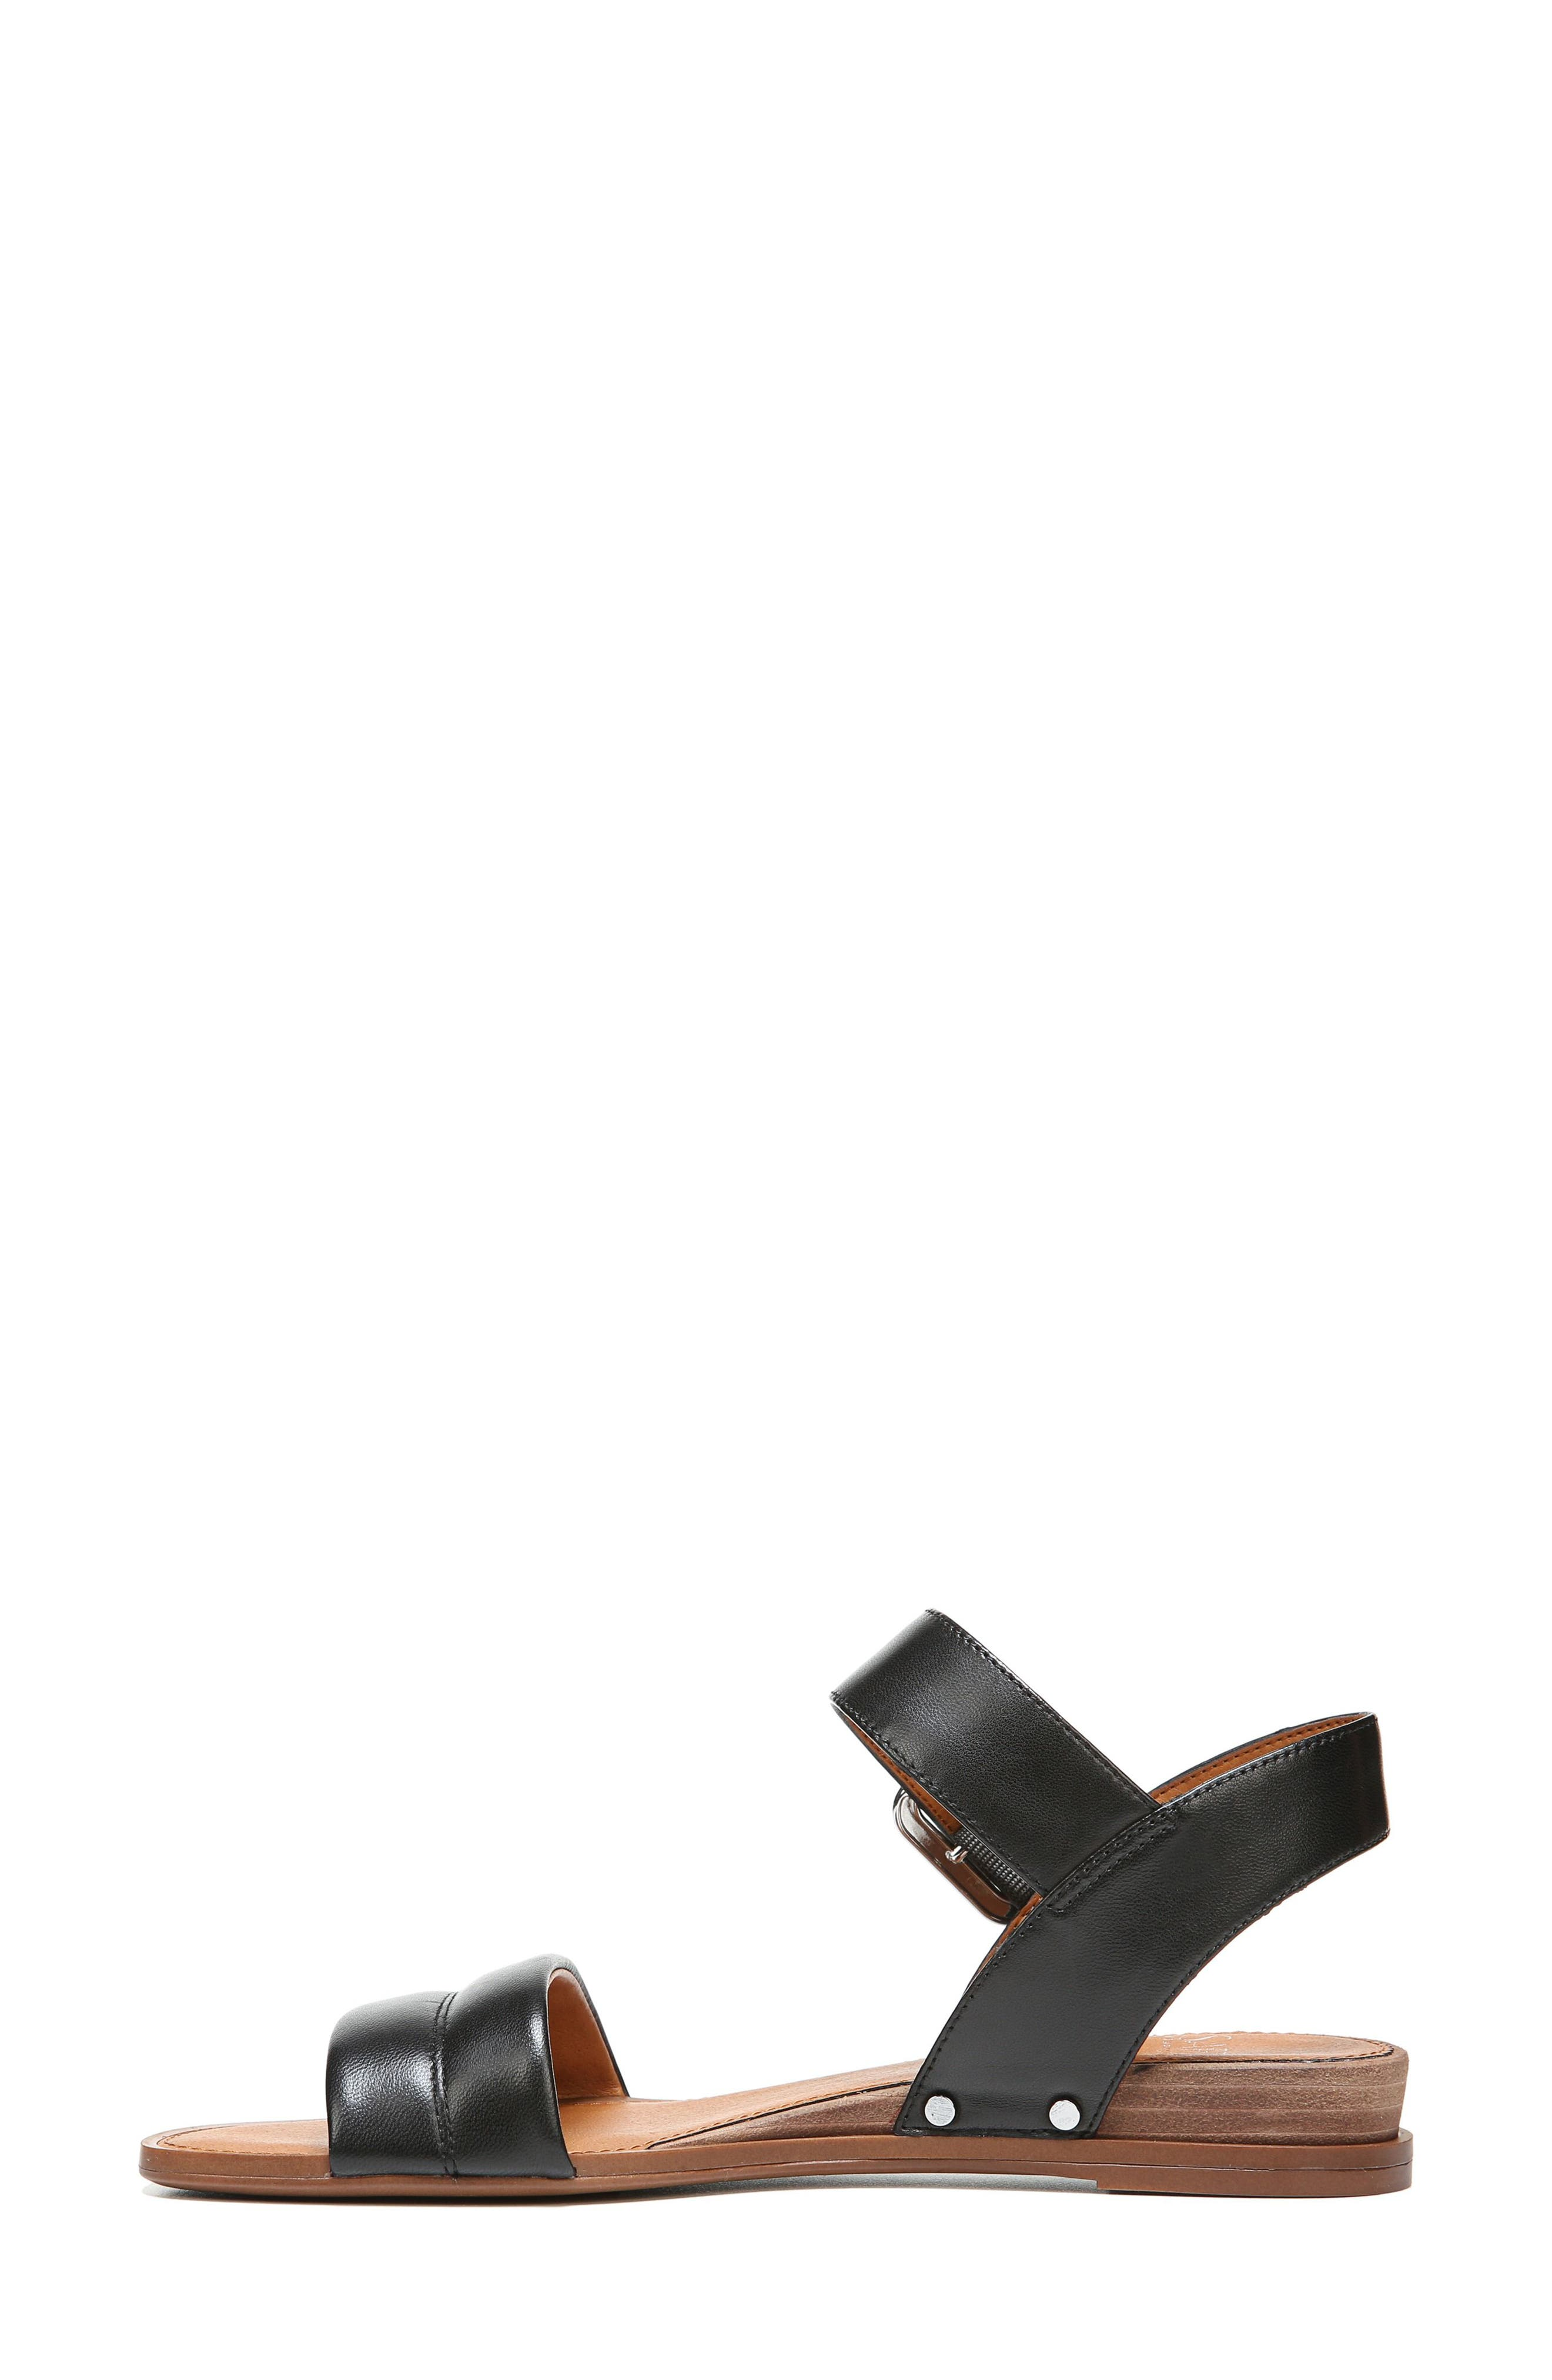 Patterson Low Wedge Sandal,                             Alternate thumbnail 3, color,                             001